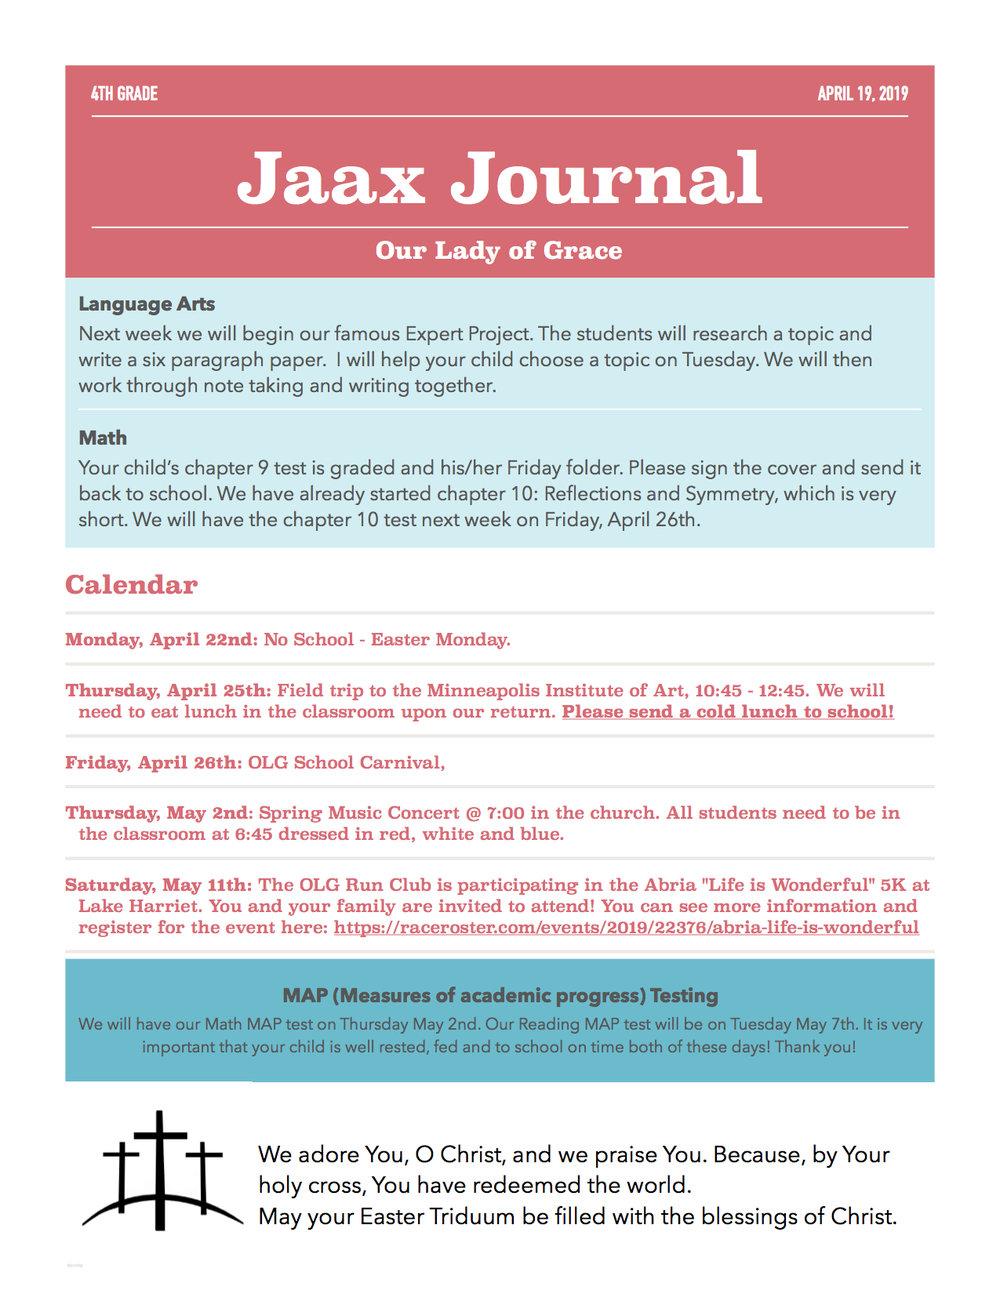 JaaxJournal4-19-19.jpg